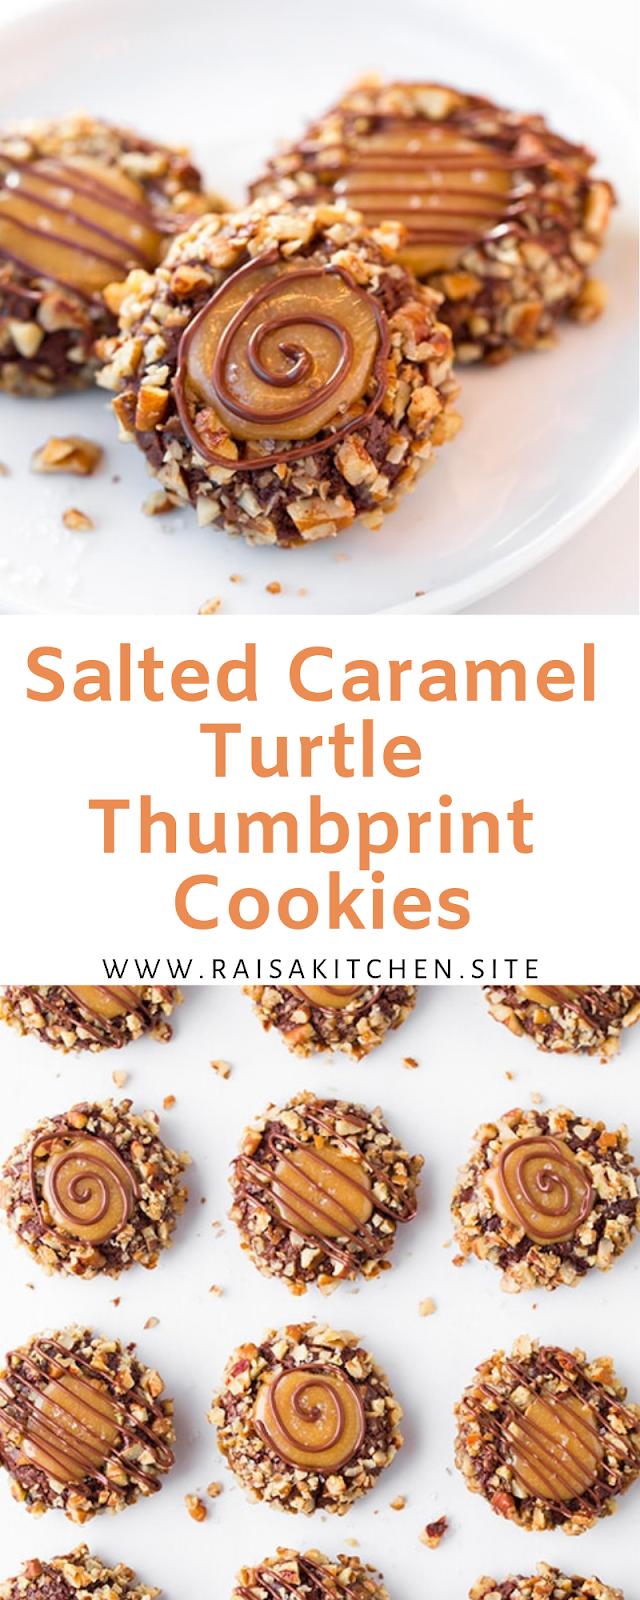 Salted Caramel Turtle Thumbprint Cookies